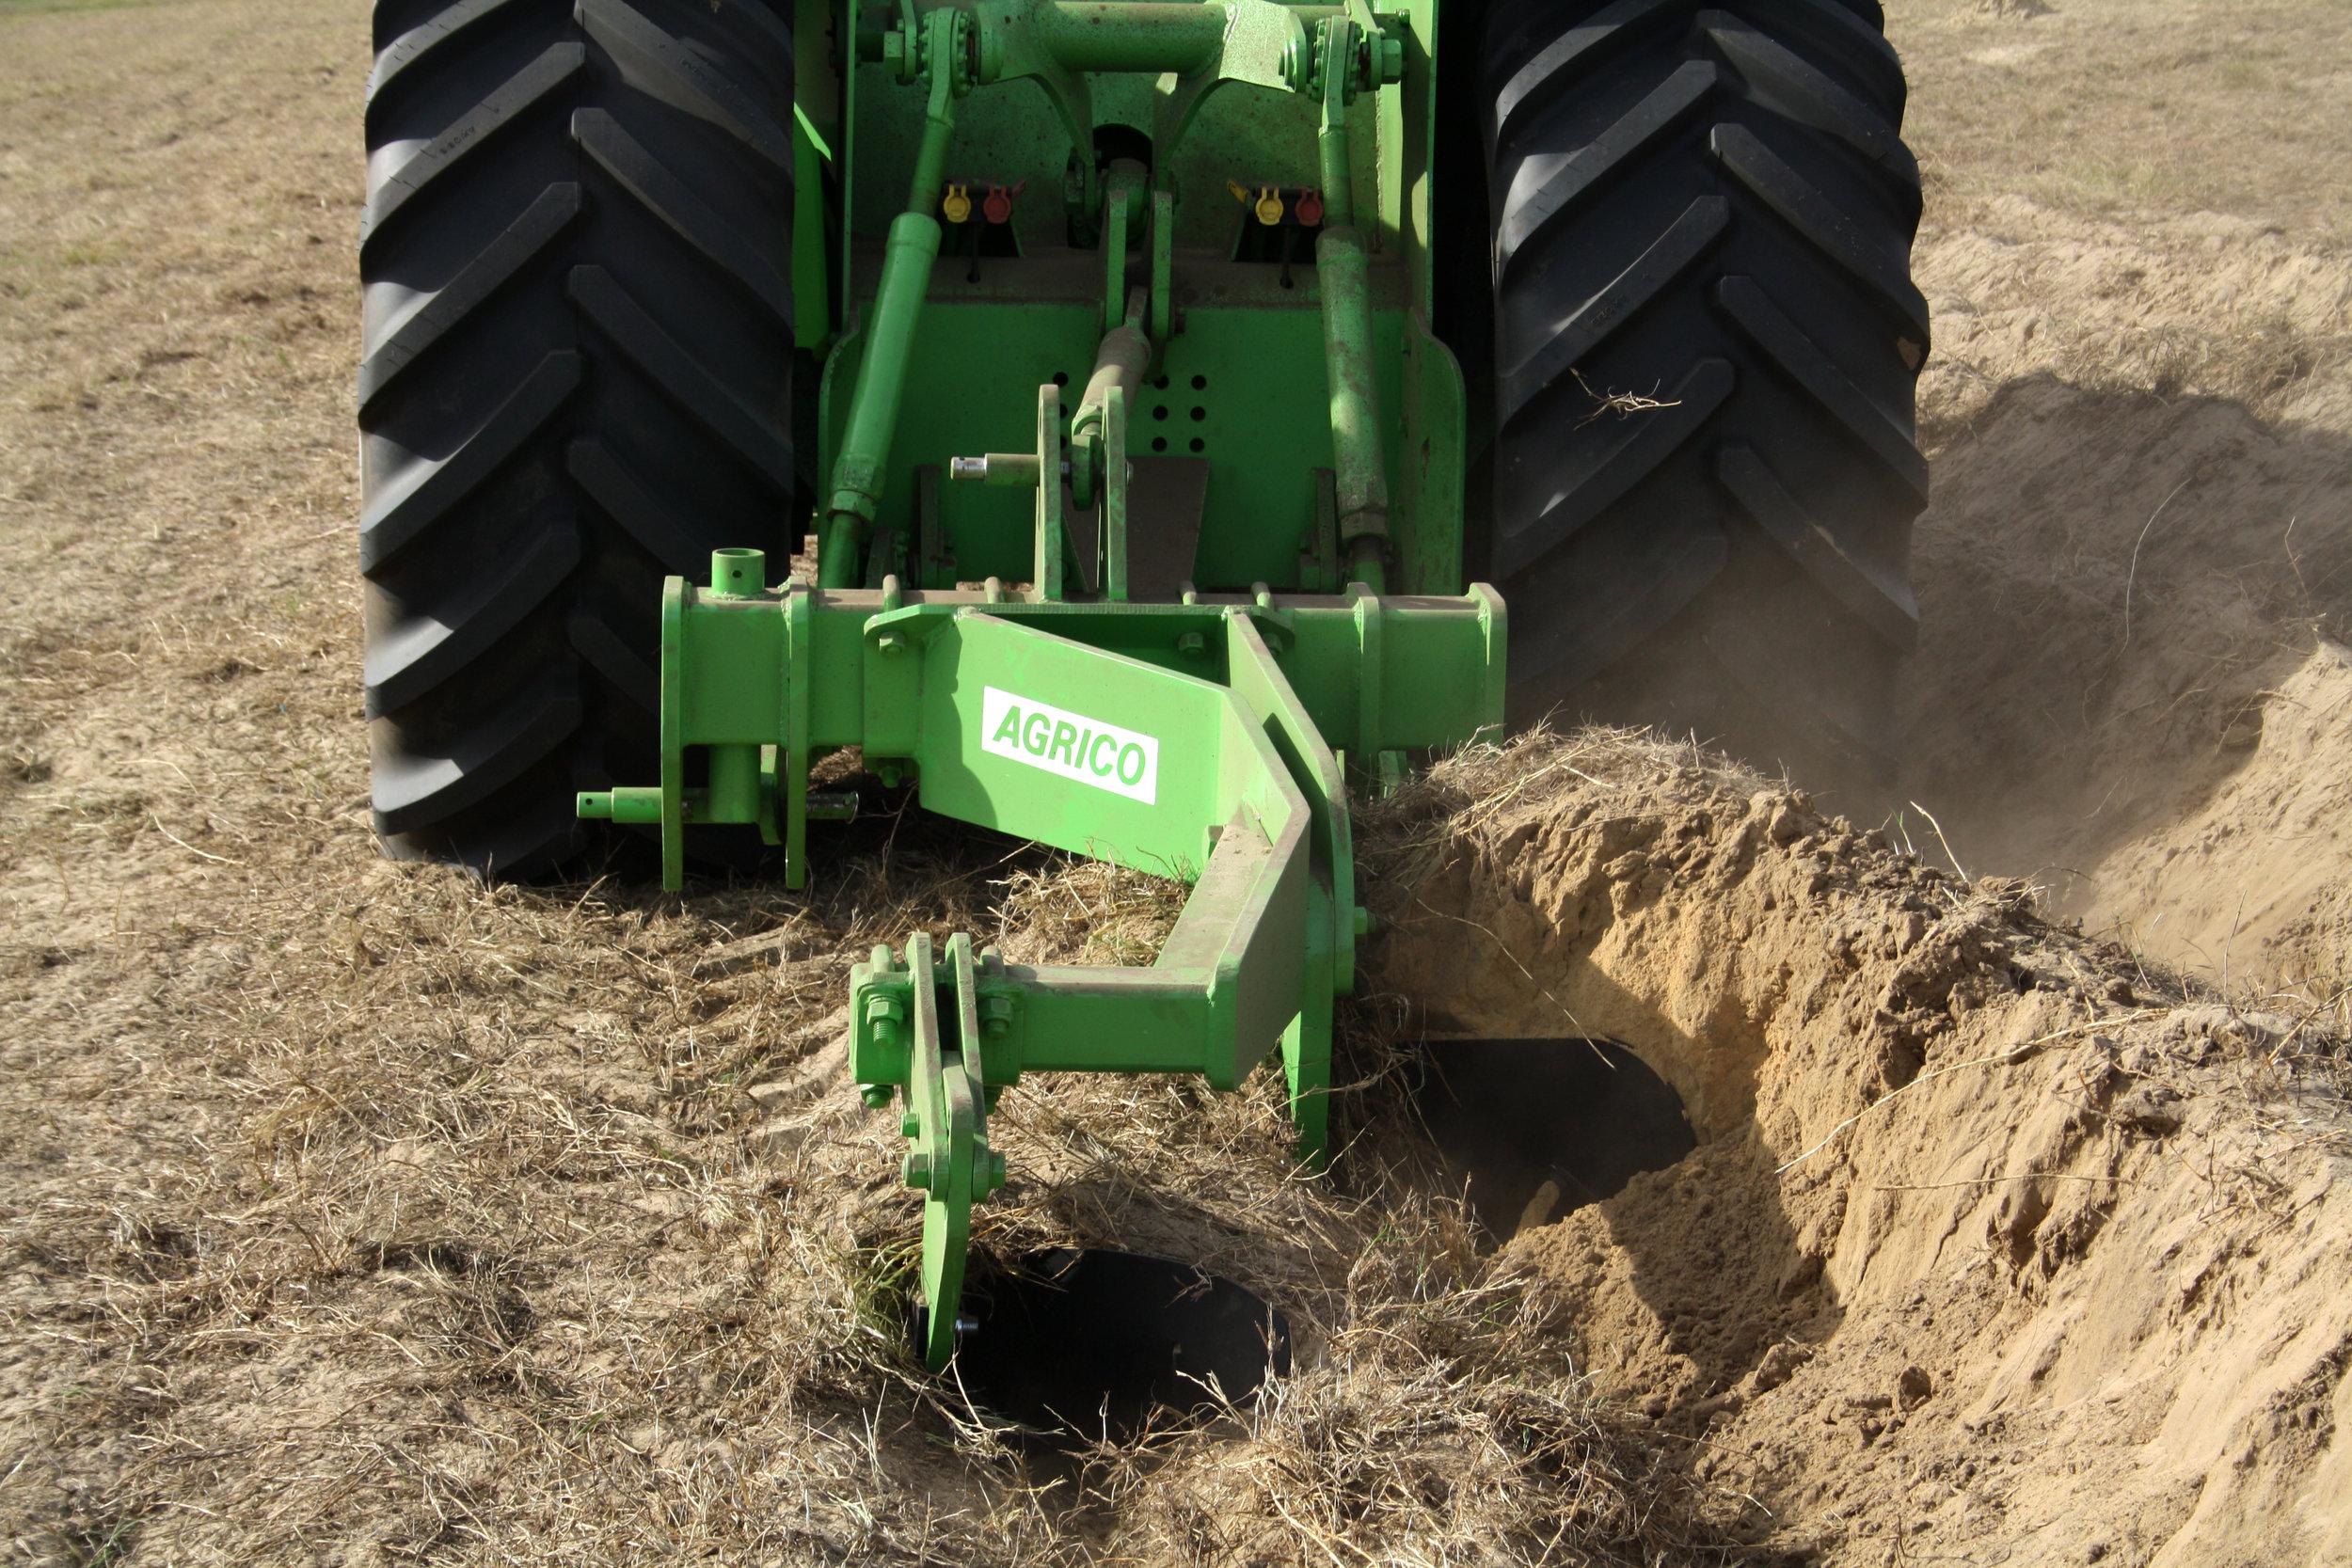 FMG Delving Plow